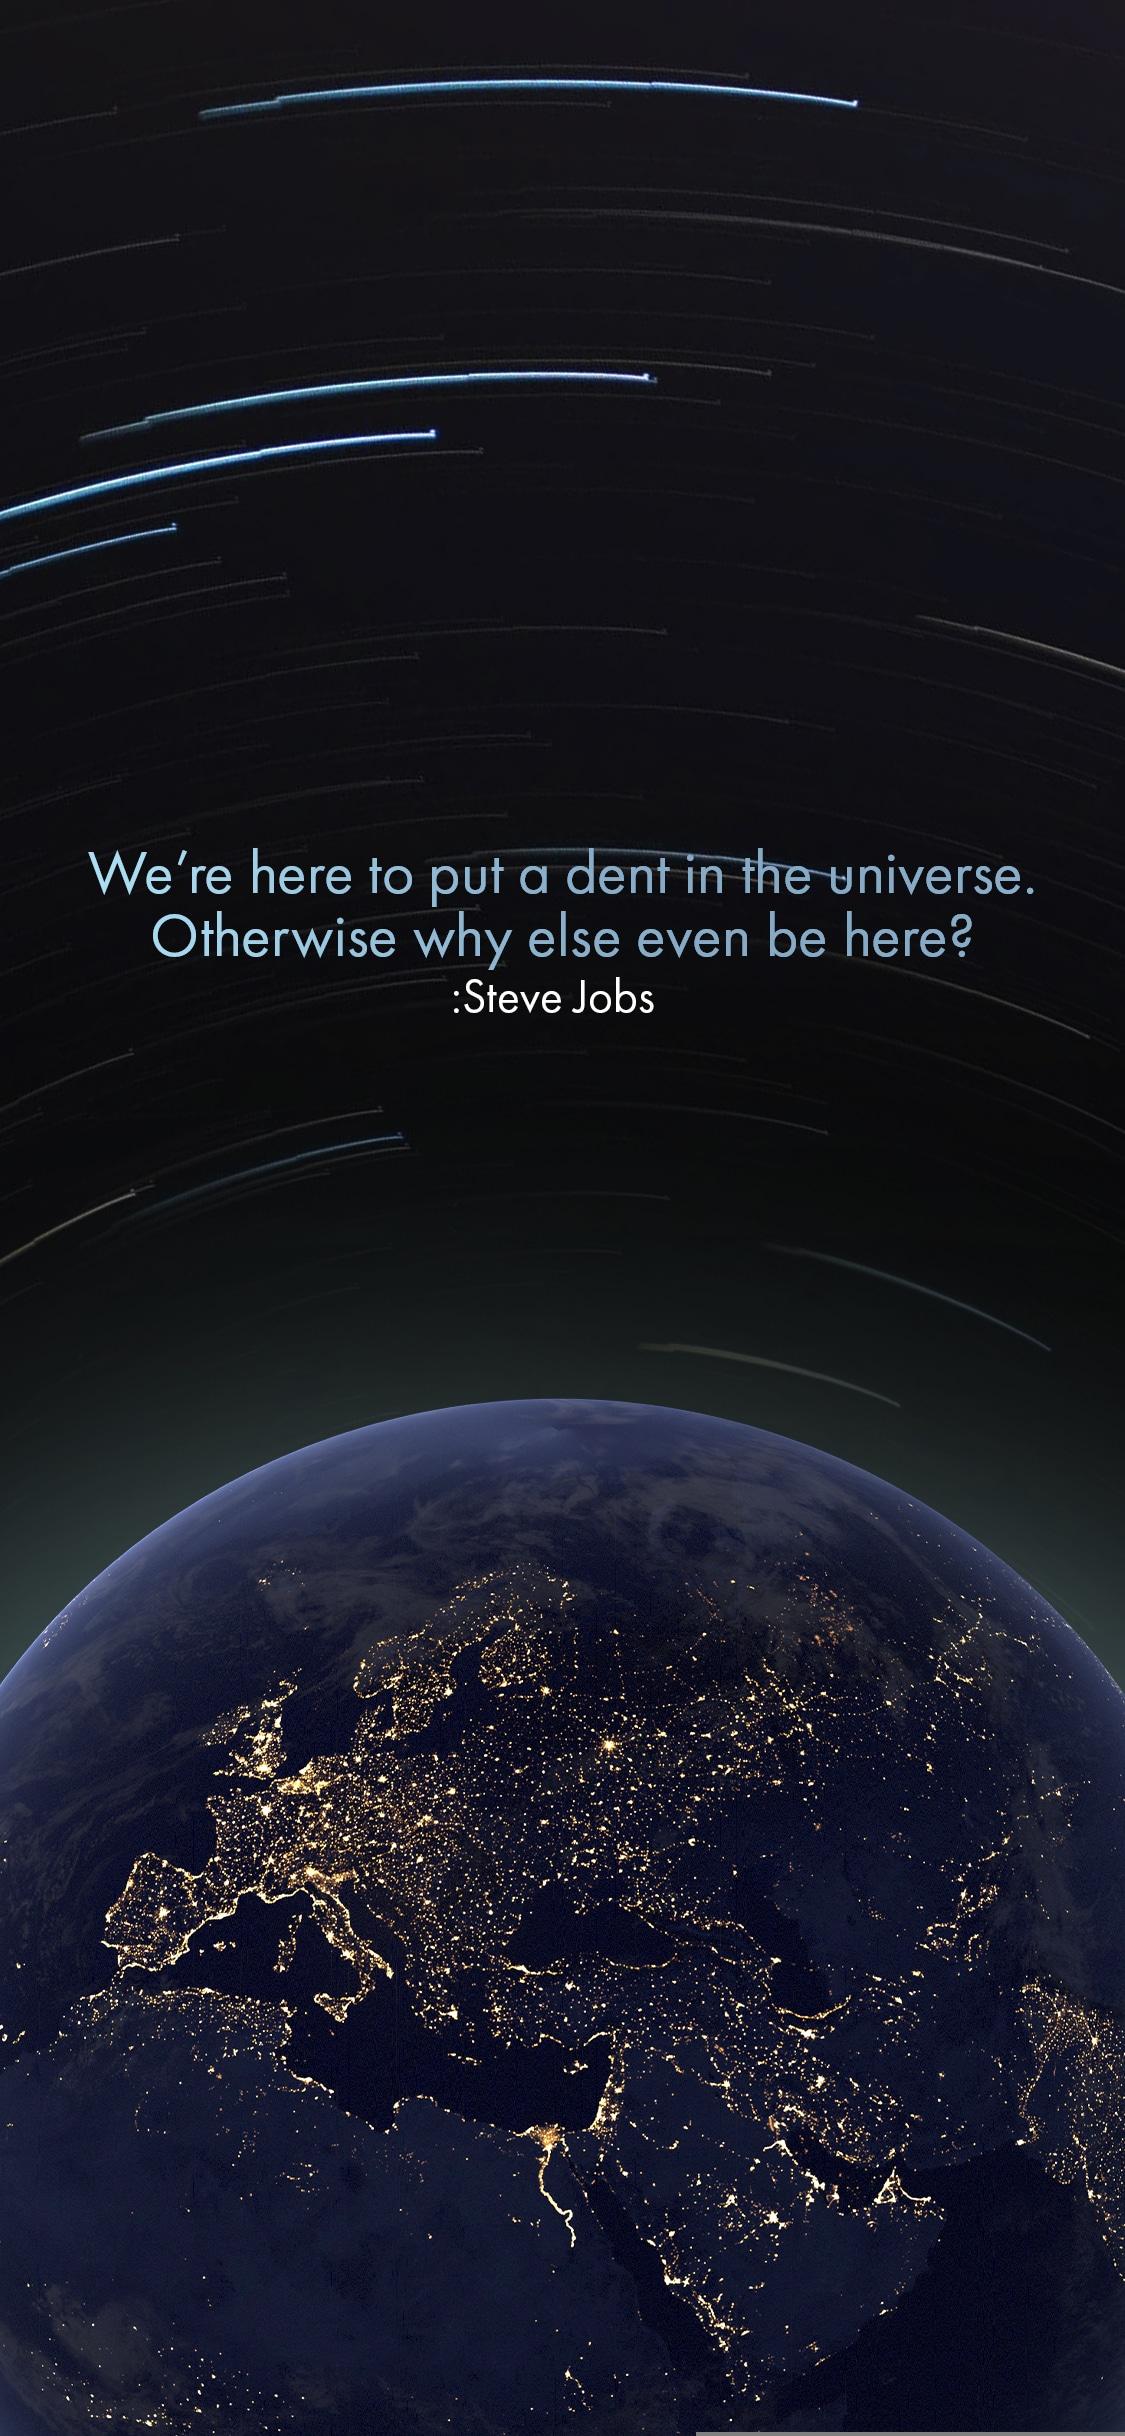 Steve Jobs Inspiring quote 6